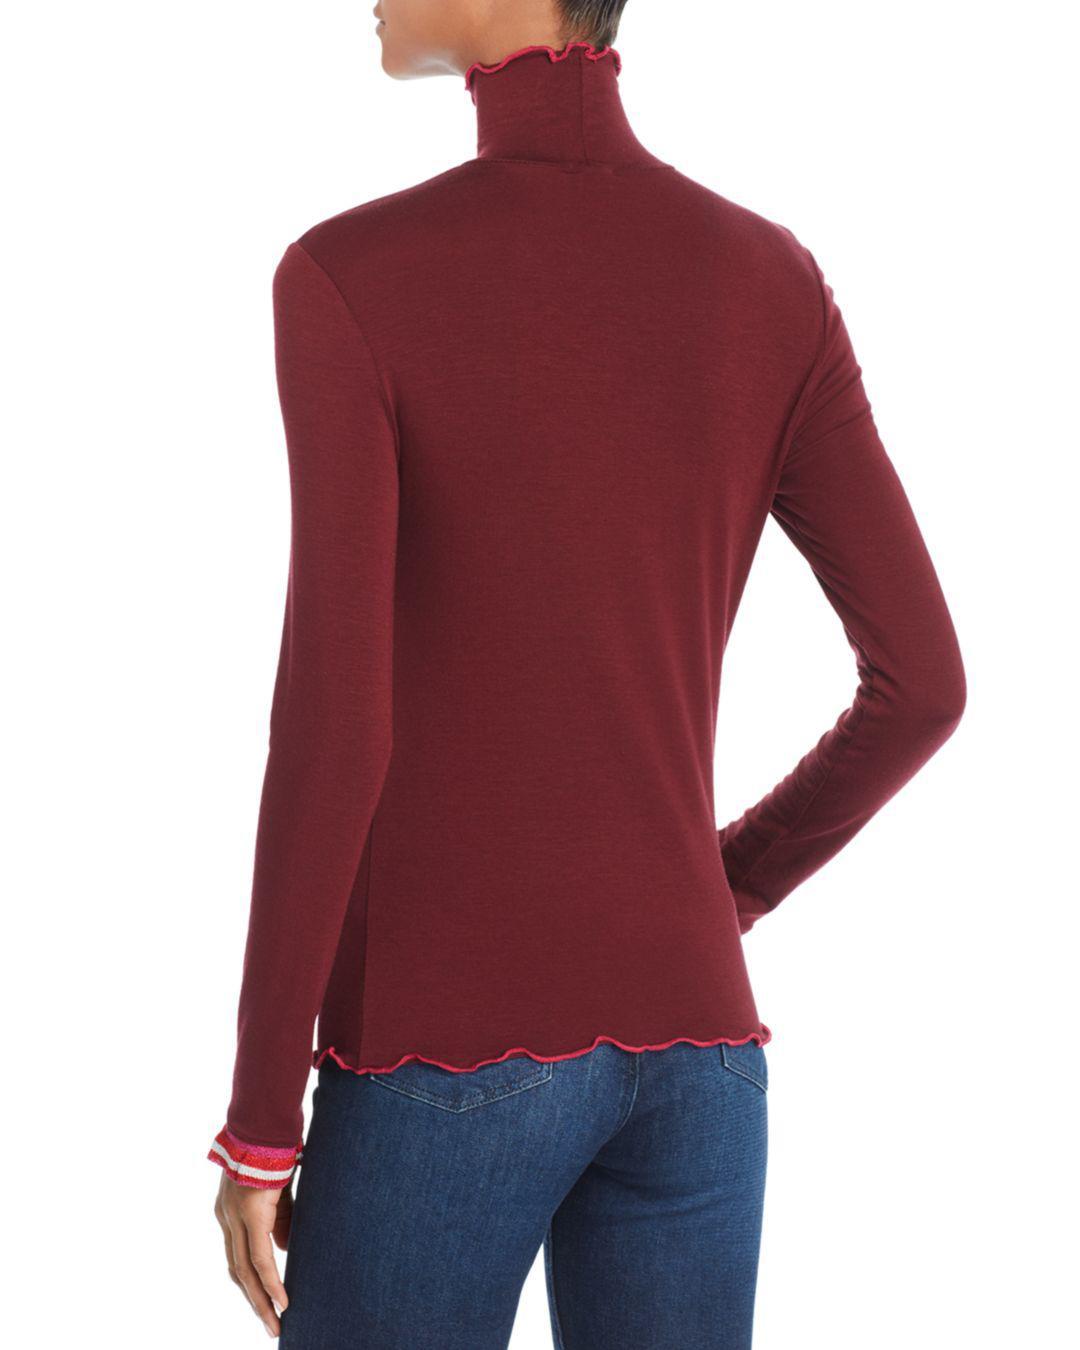 89c915801f Lyst - Splendid X Margherita Dolce Vita Turtleneck Tee in Red